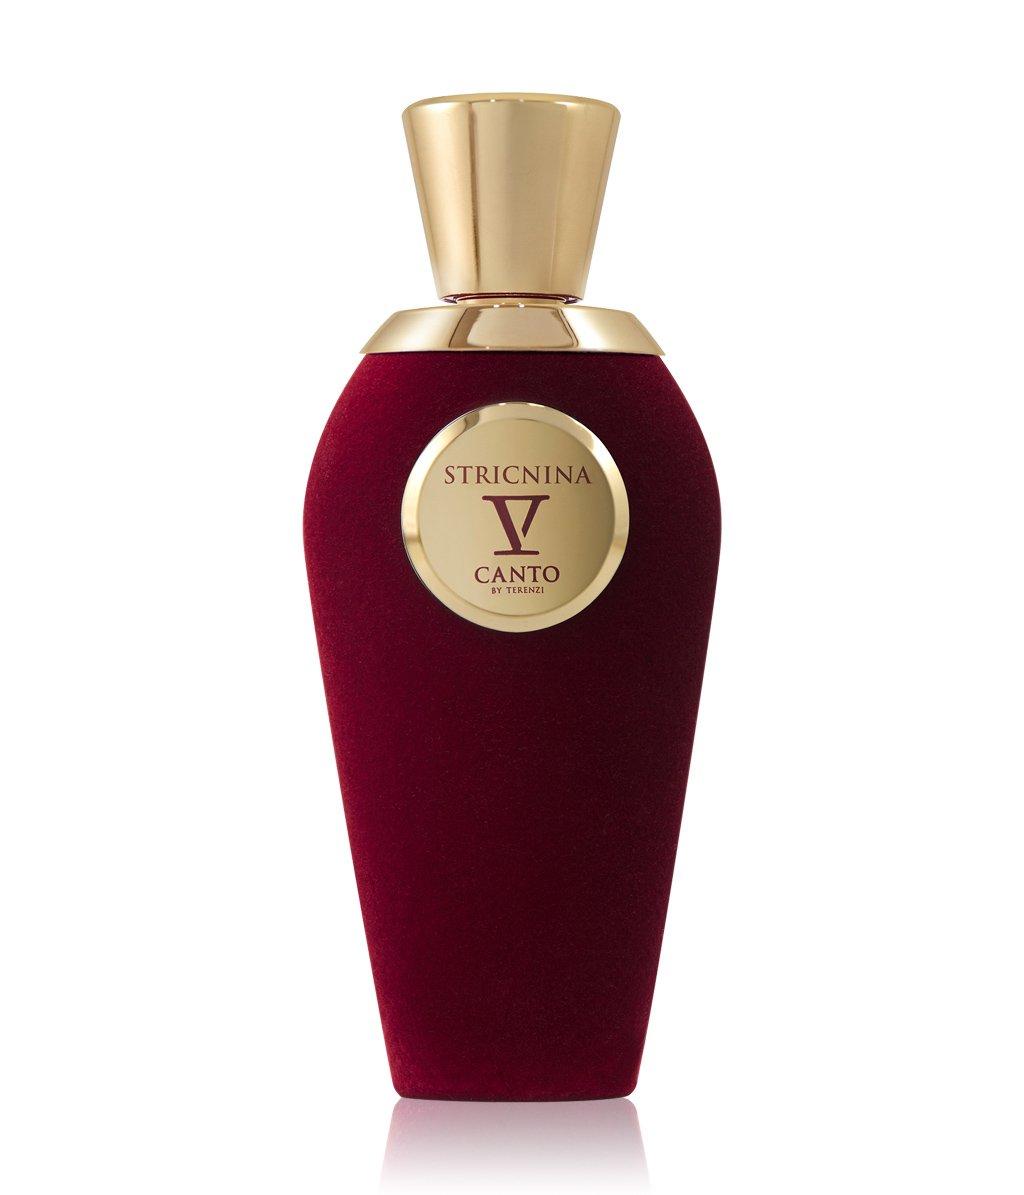 sind die parfums bei flaconi original